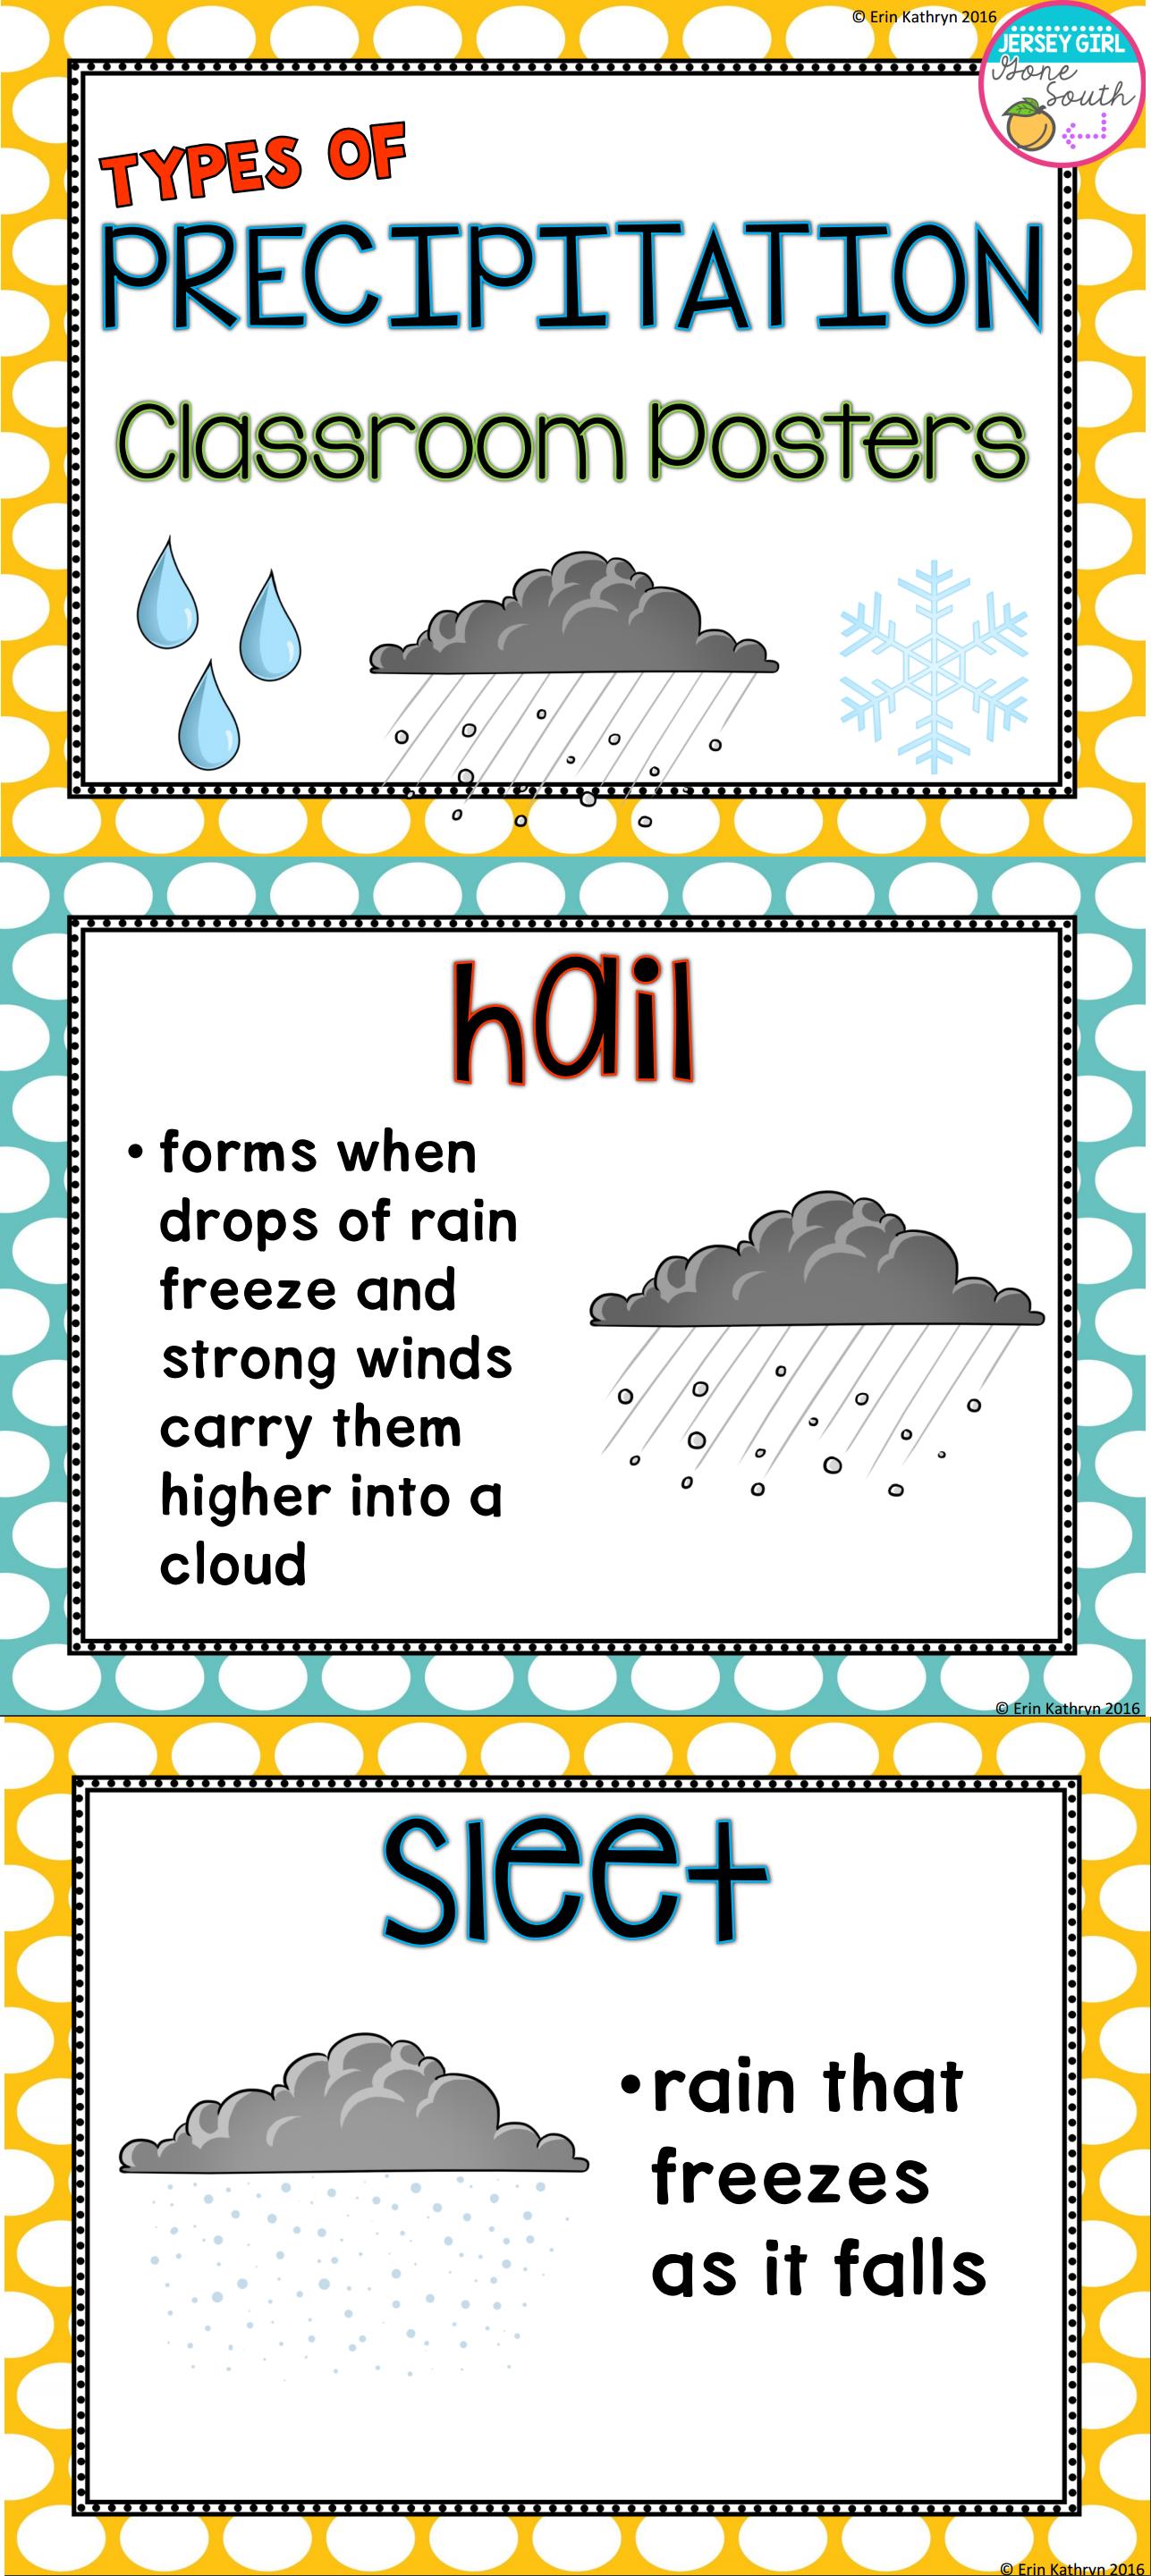 Types Of Precipitation Classroom Posters